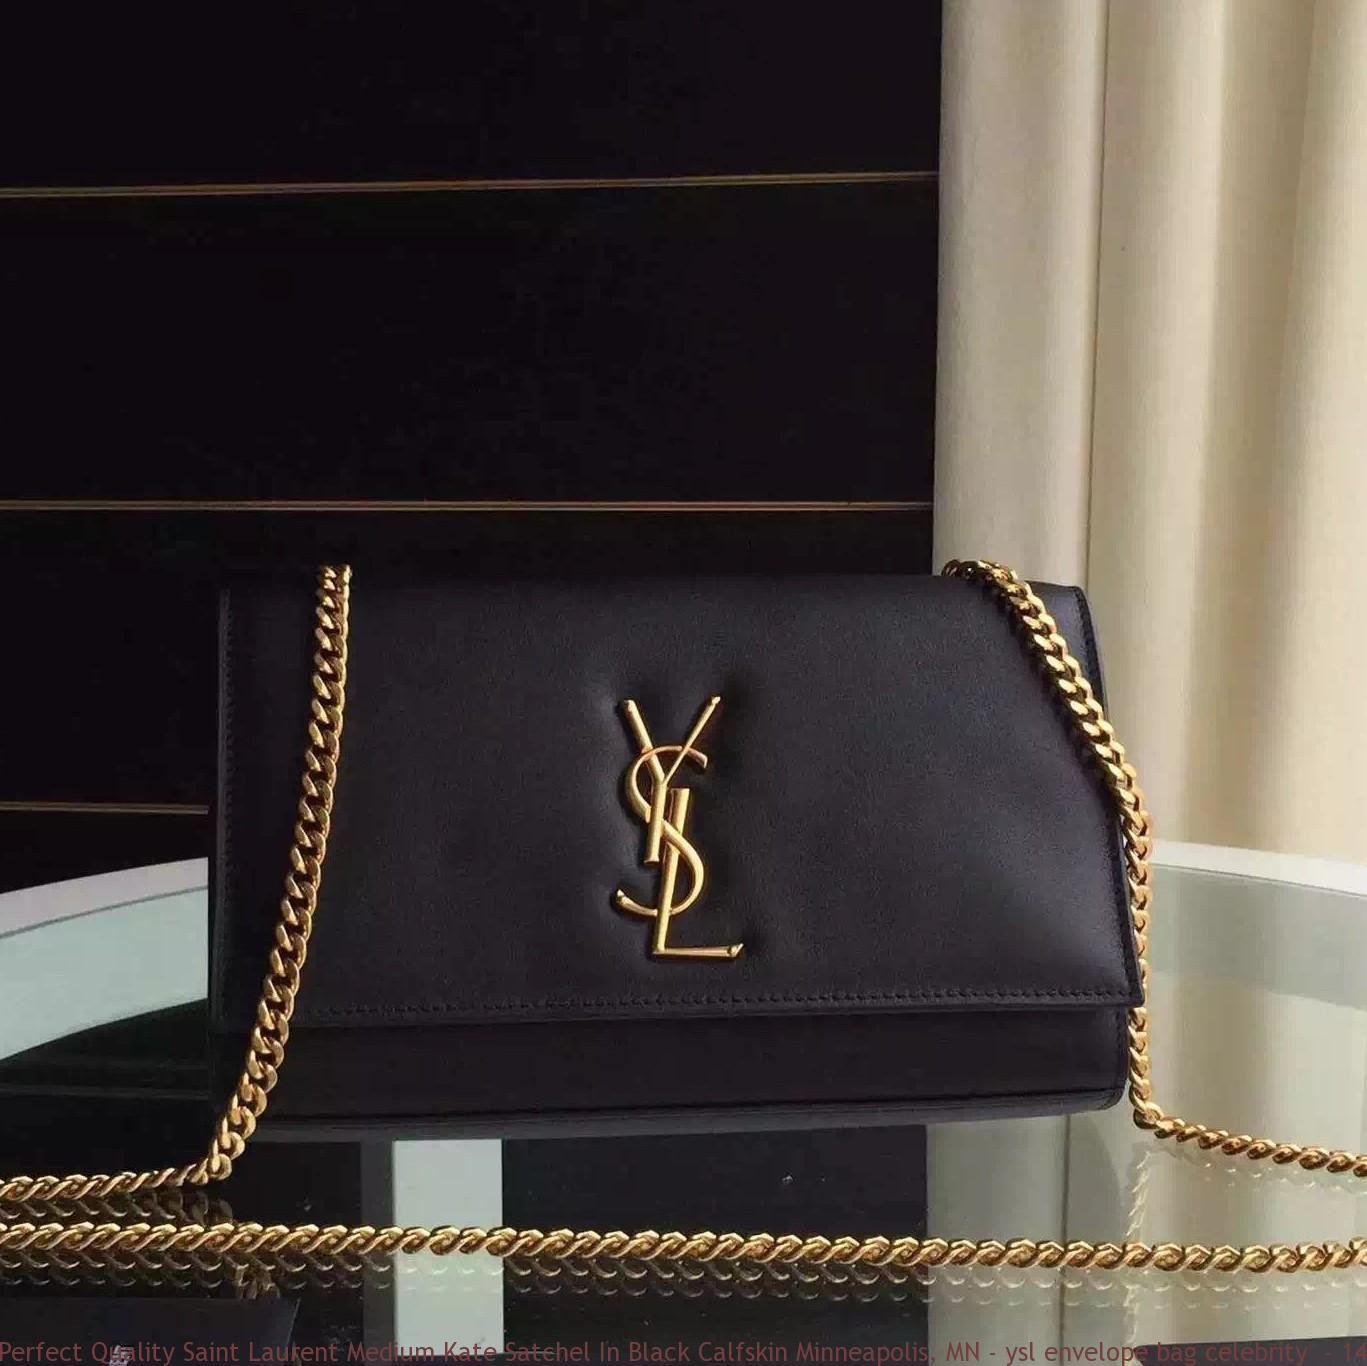 Perfect Quality Saint Laurent Medium Kate Satchel In Black